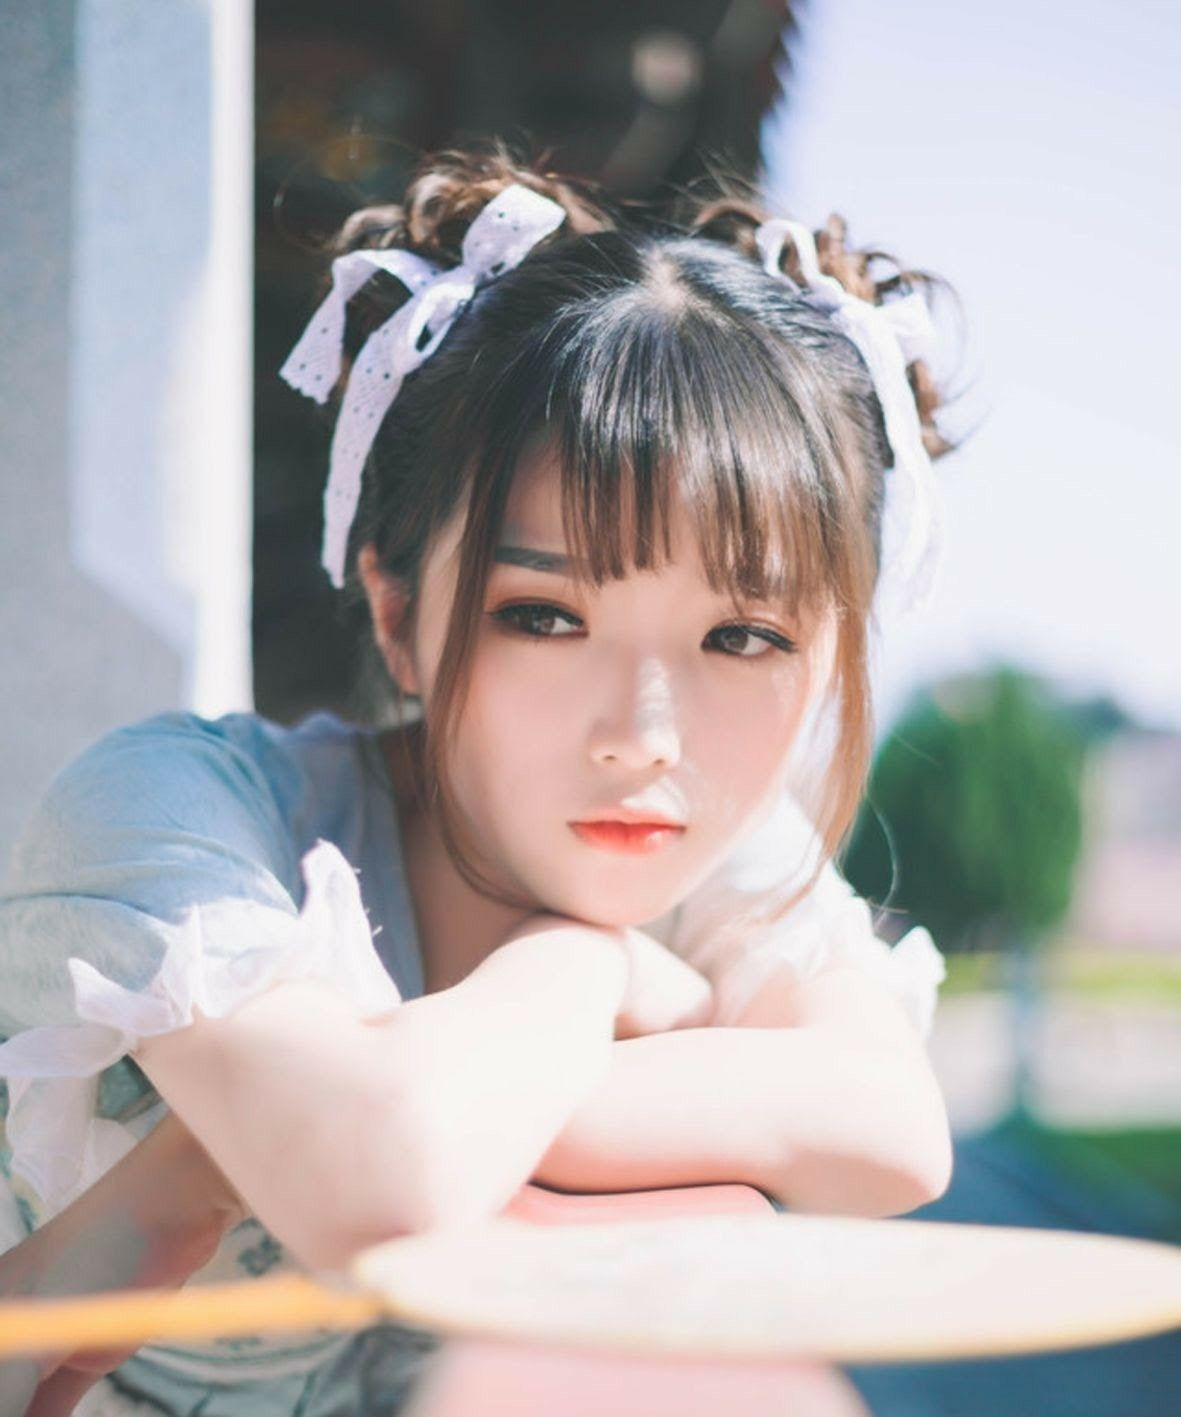 Save Folllow Not Save Free Lam Korean Hairstyle Cute Girl Pic Kawaii Hairstyles